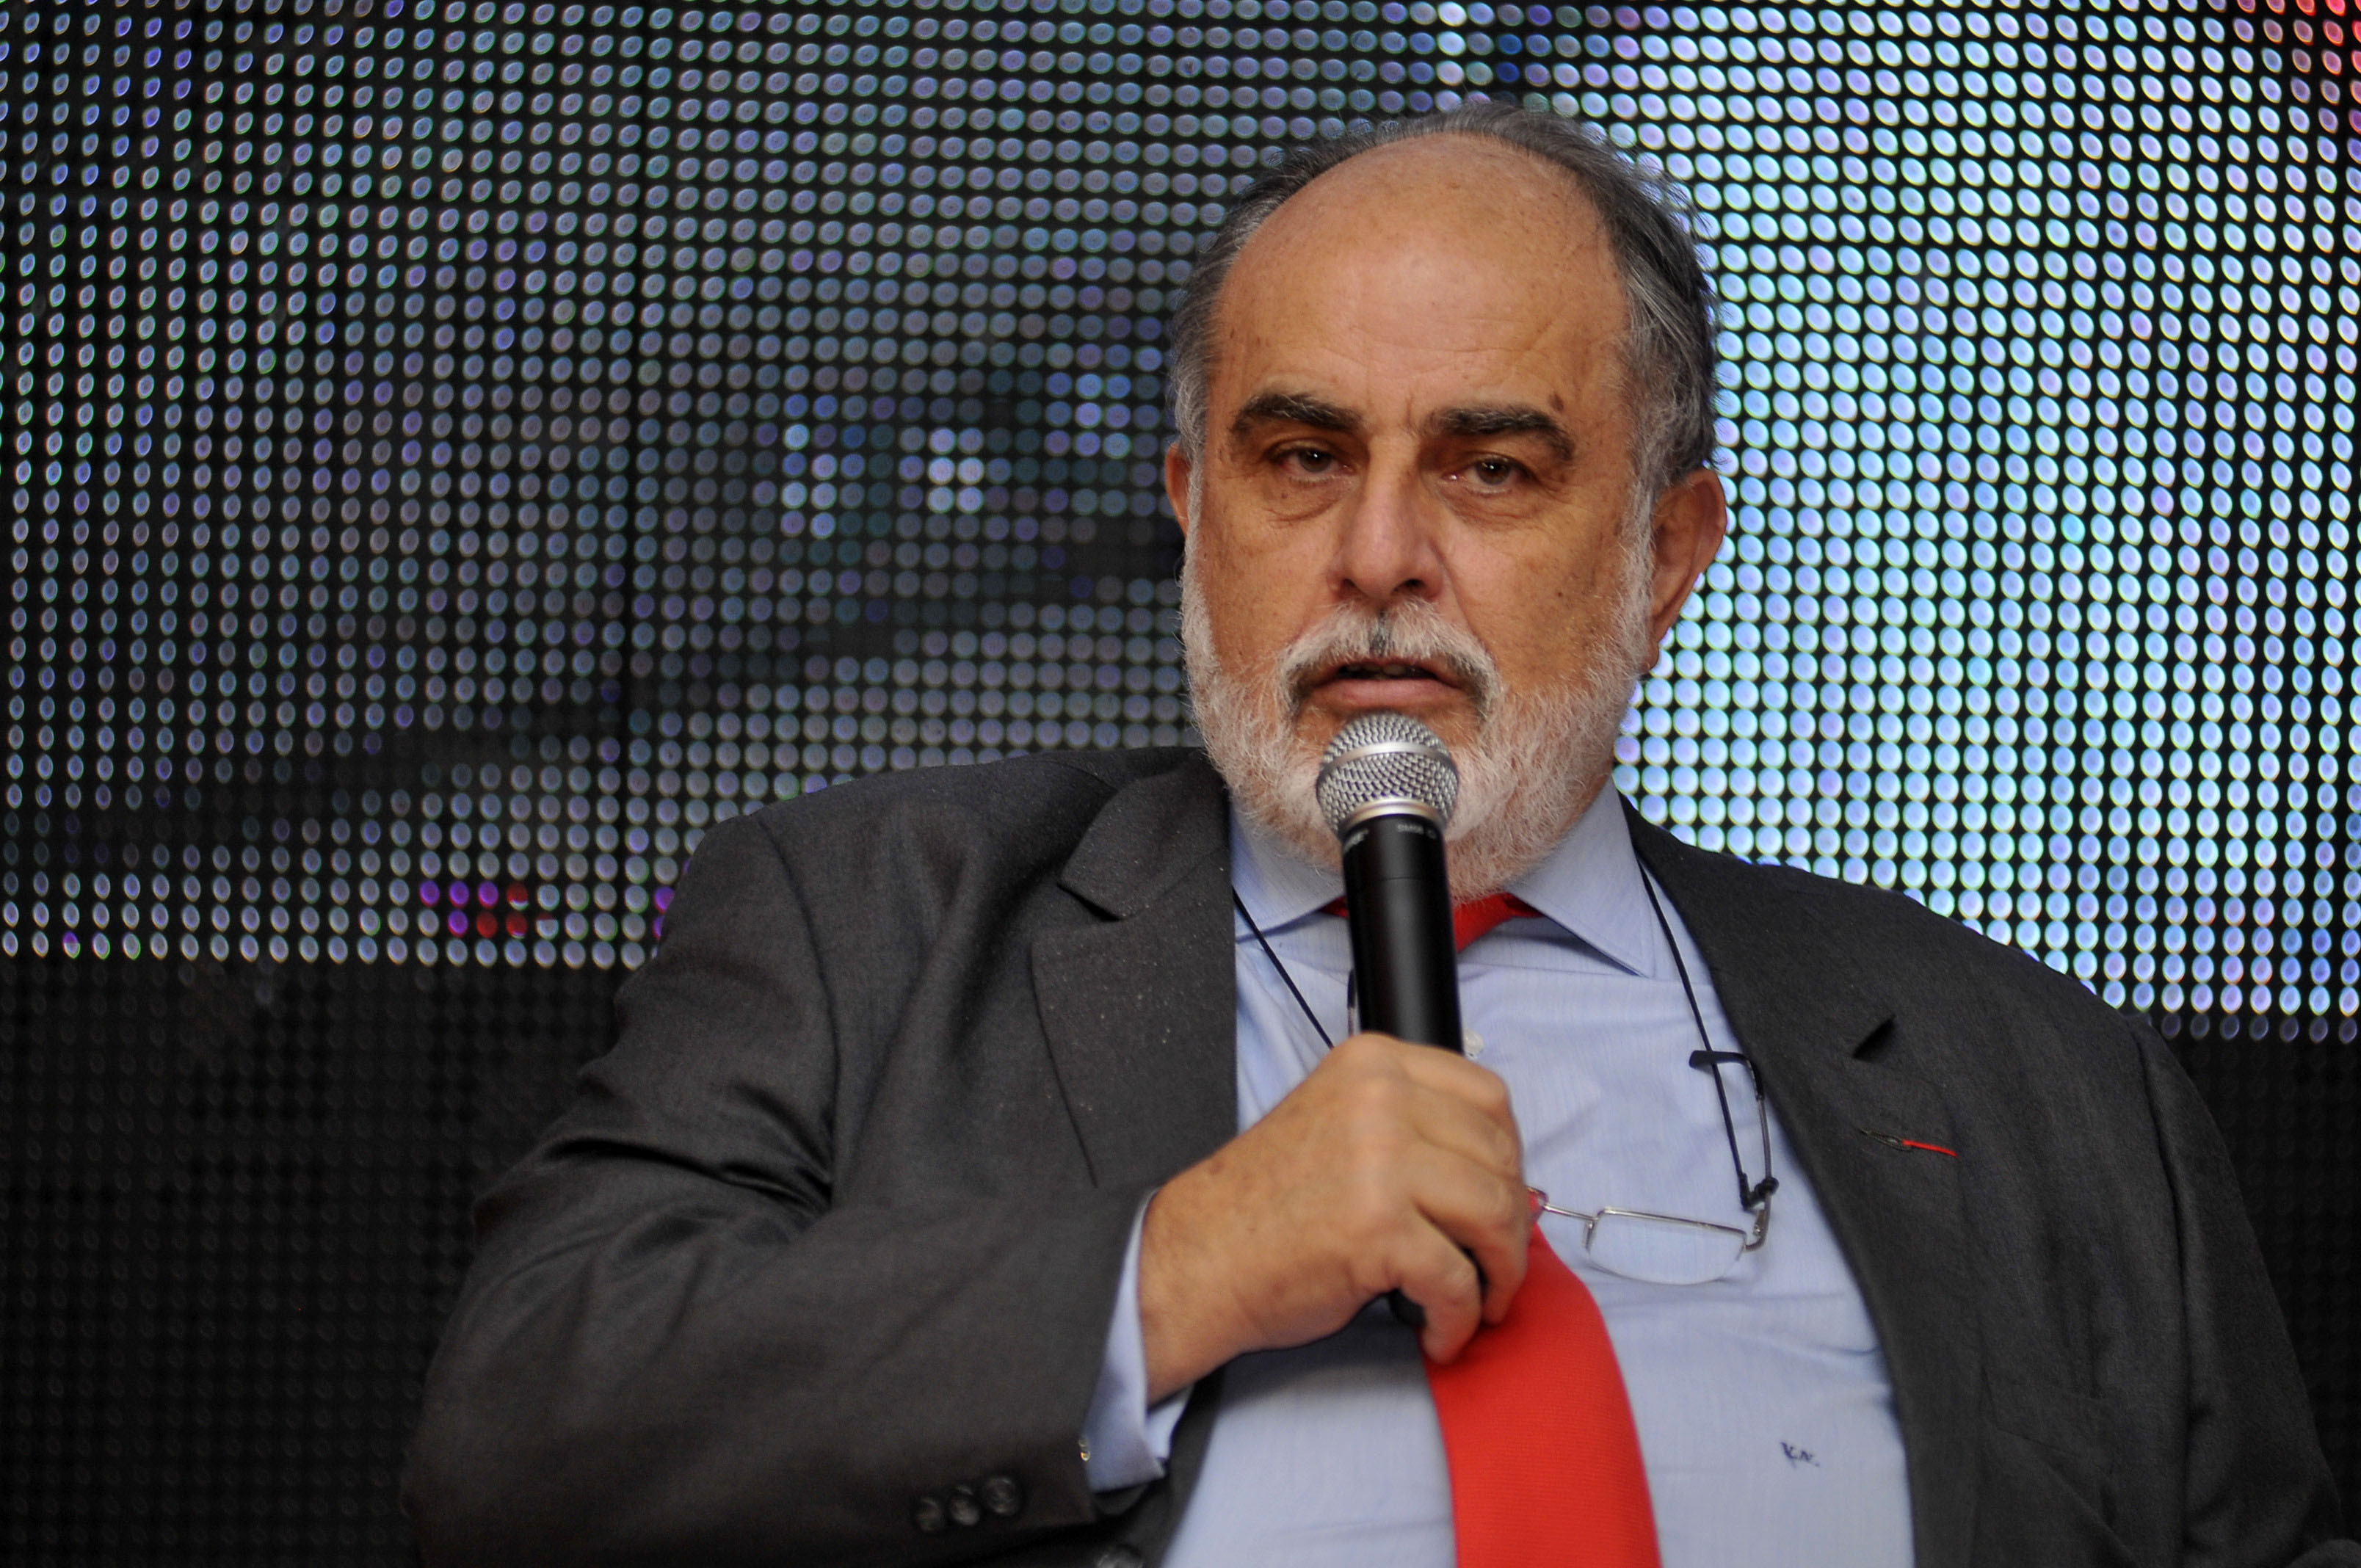 Vincenzo Nesci, PDG de Djezzy. New Press